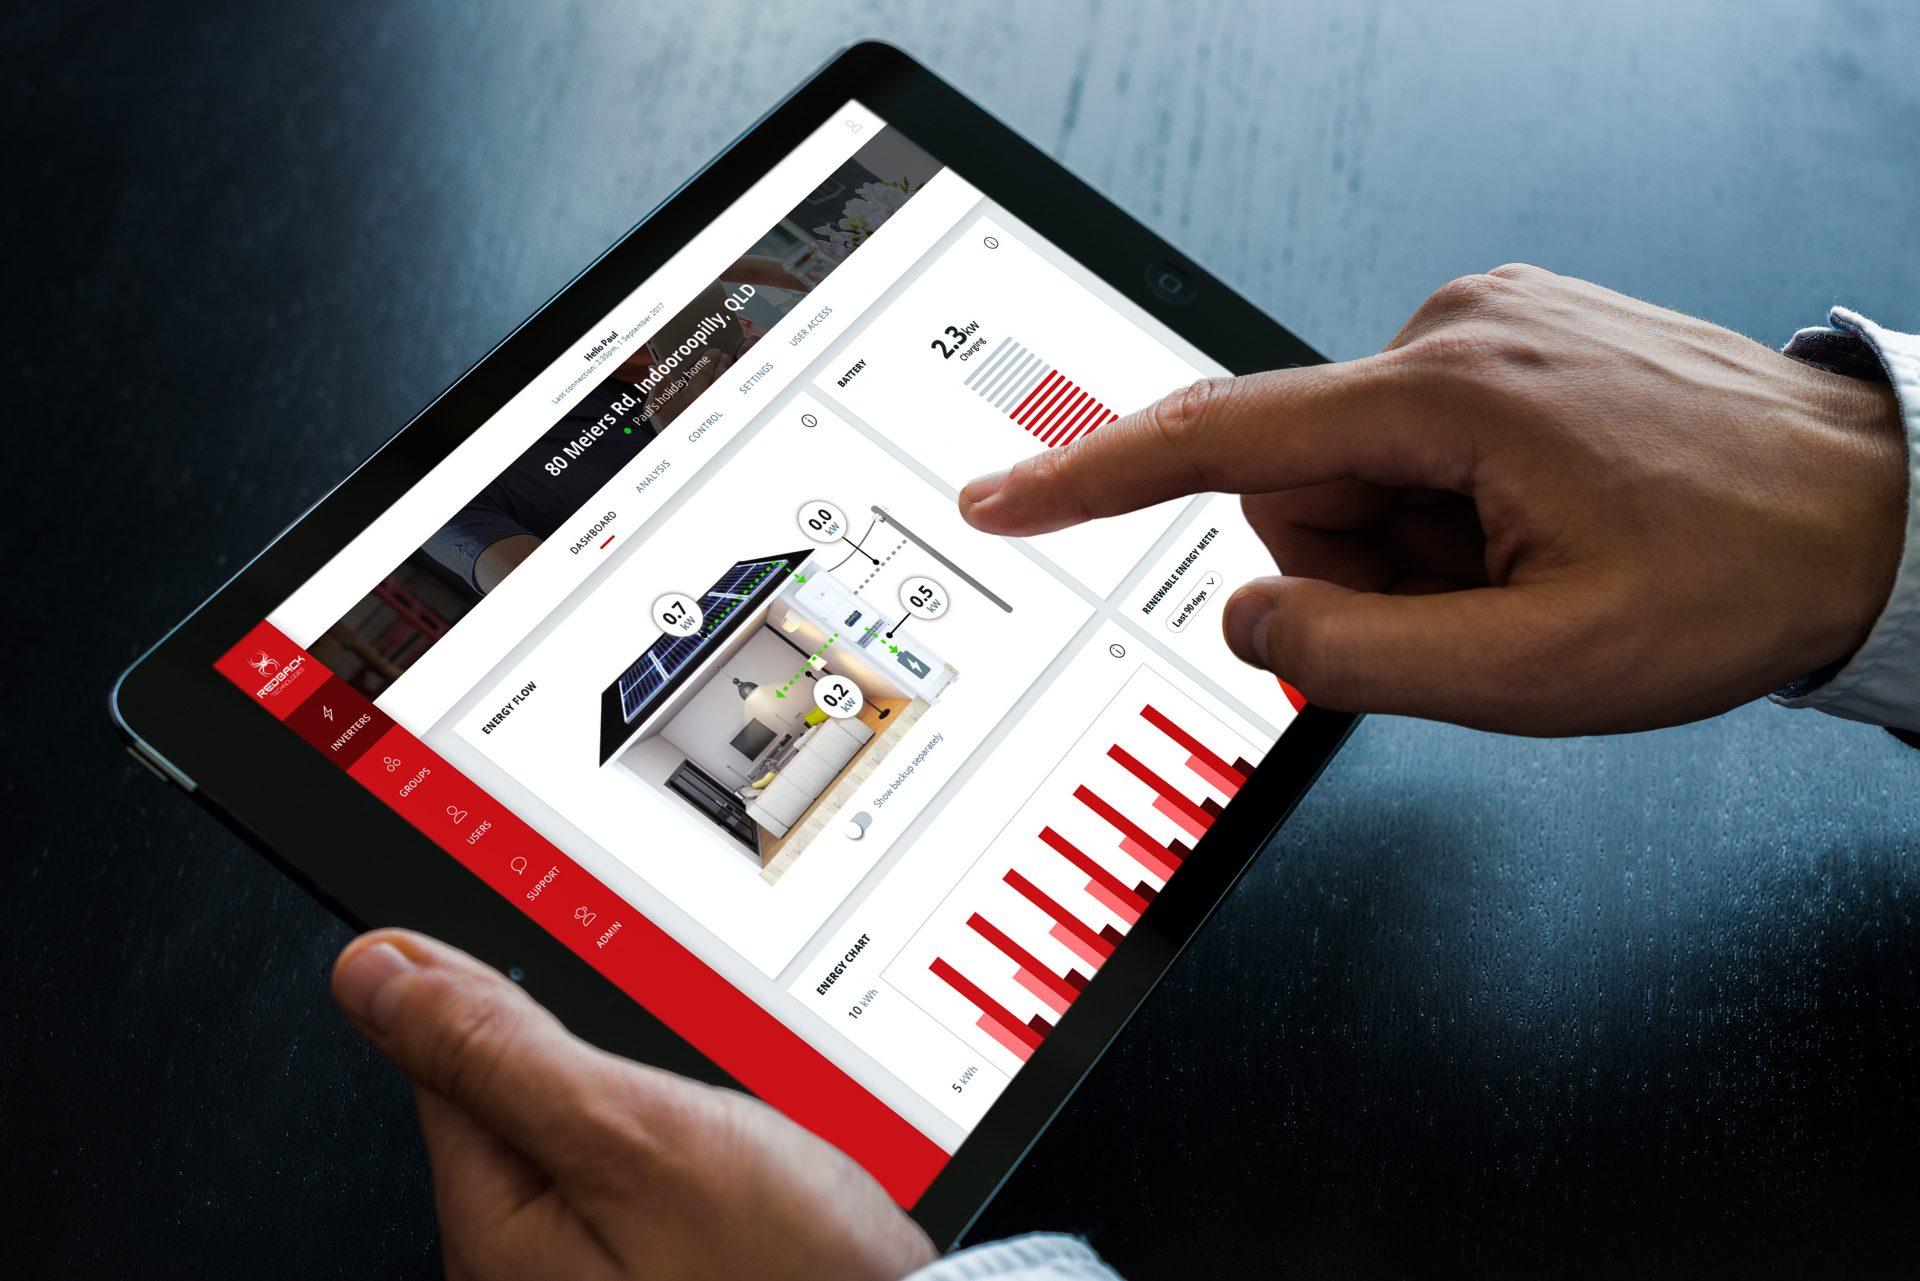 Redback website viewed on an iPad